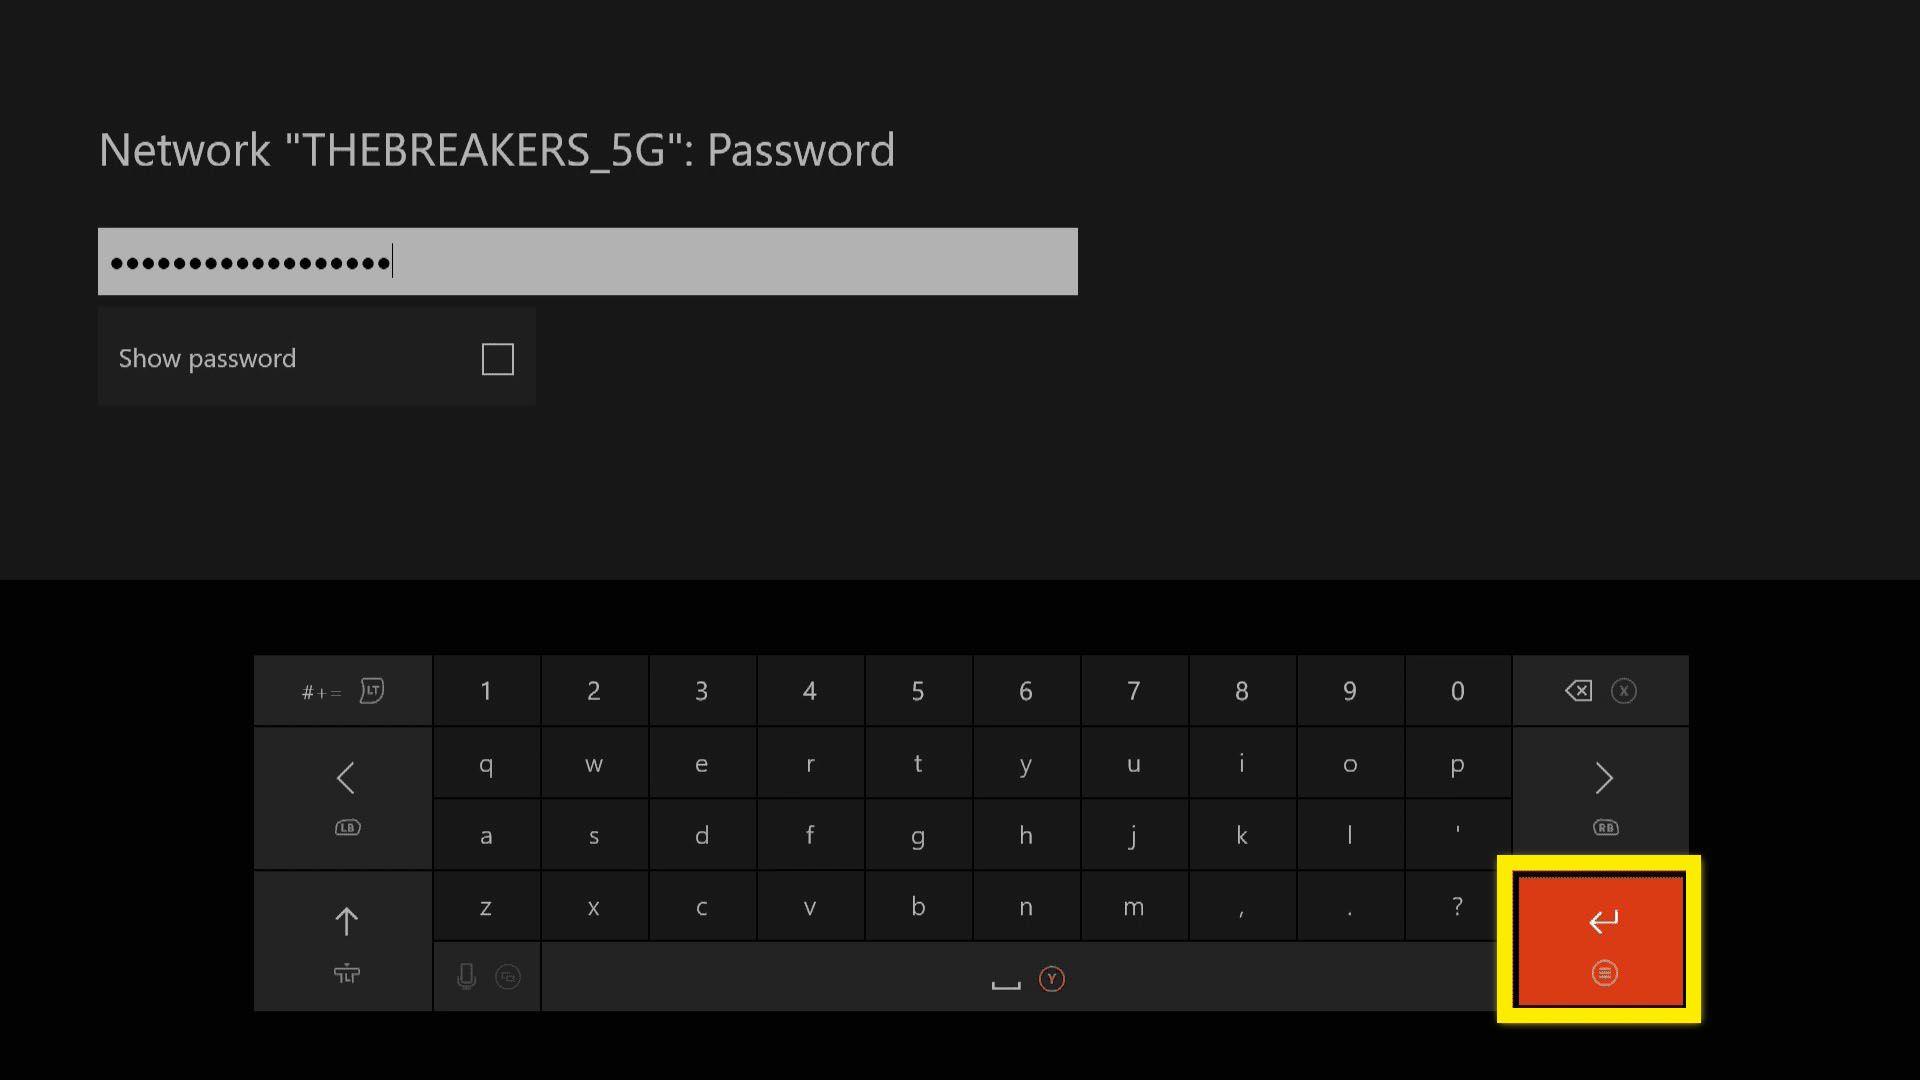 Xbox One wireless network password screen